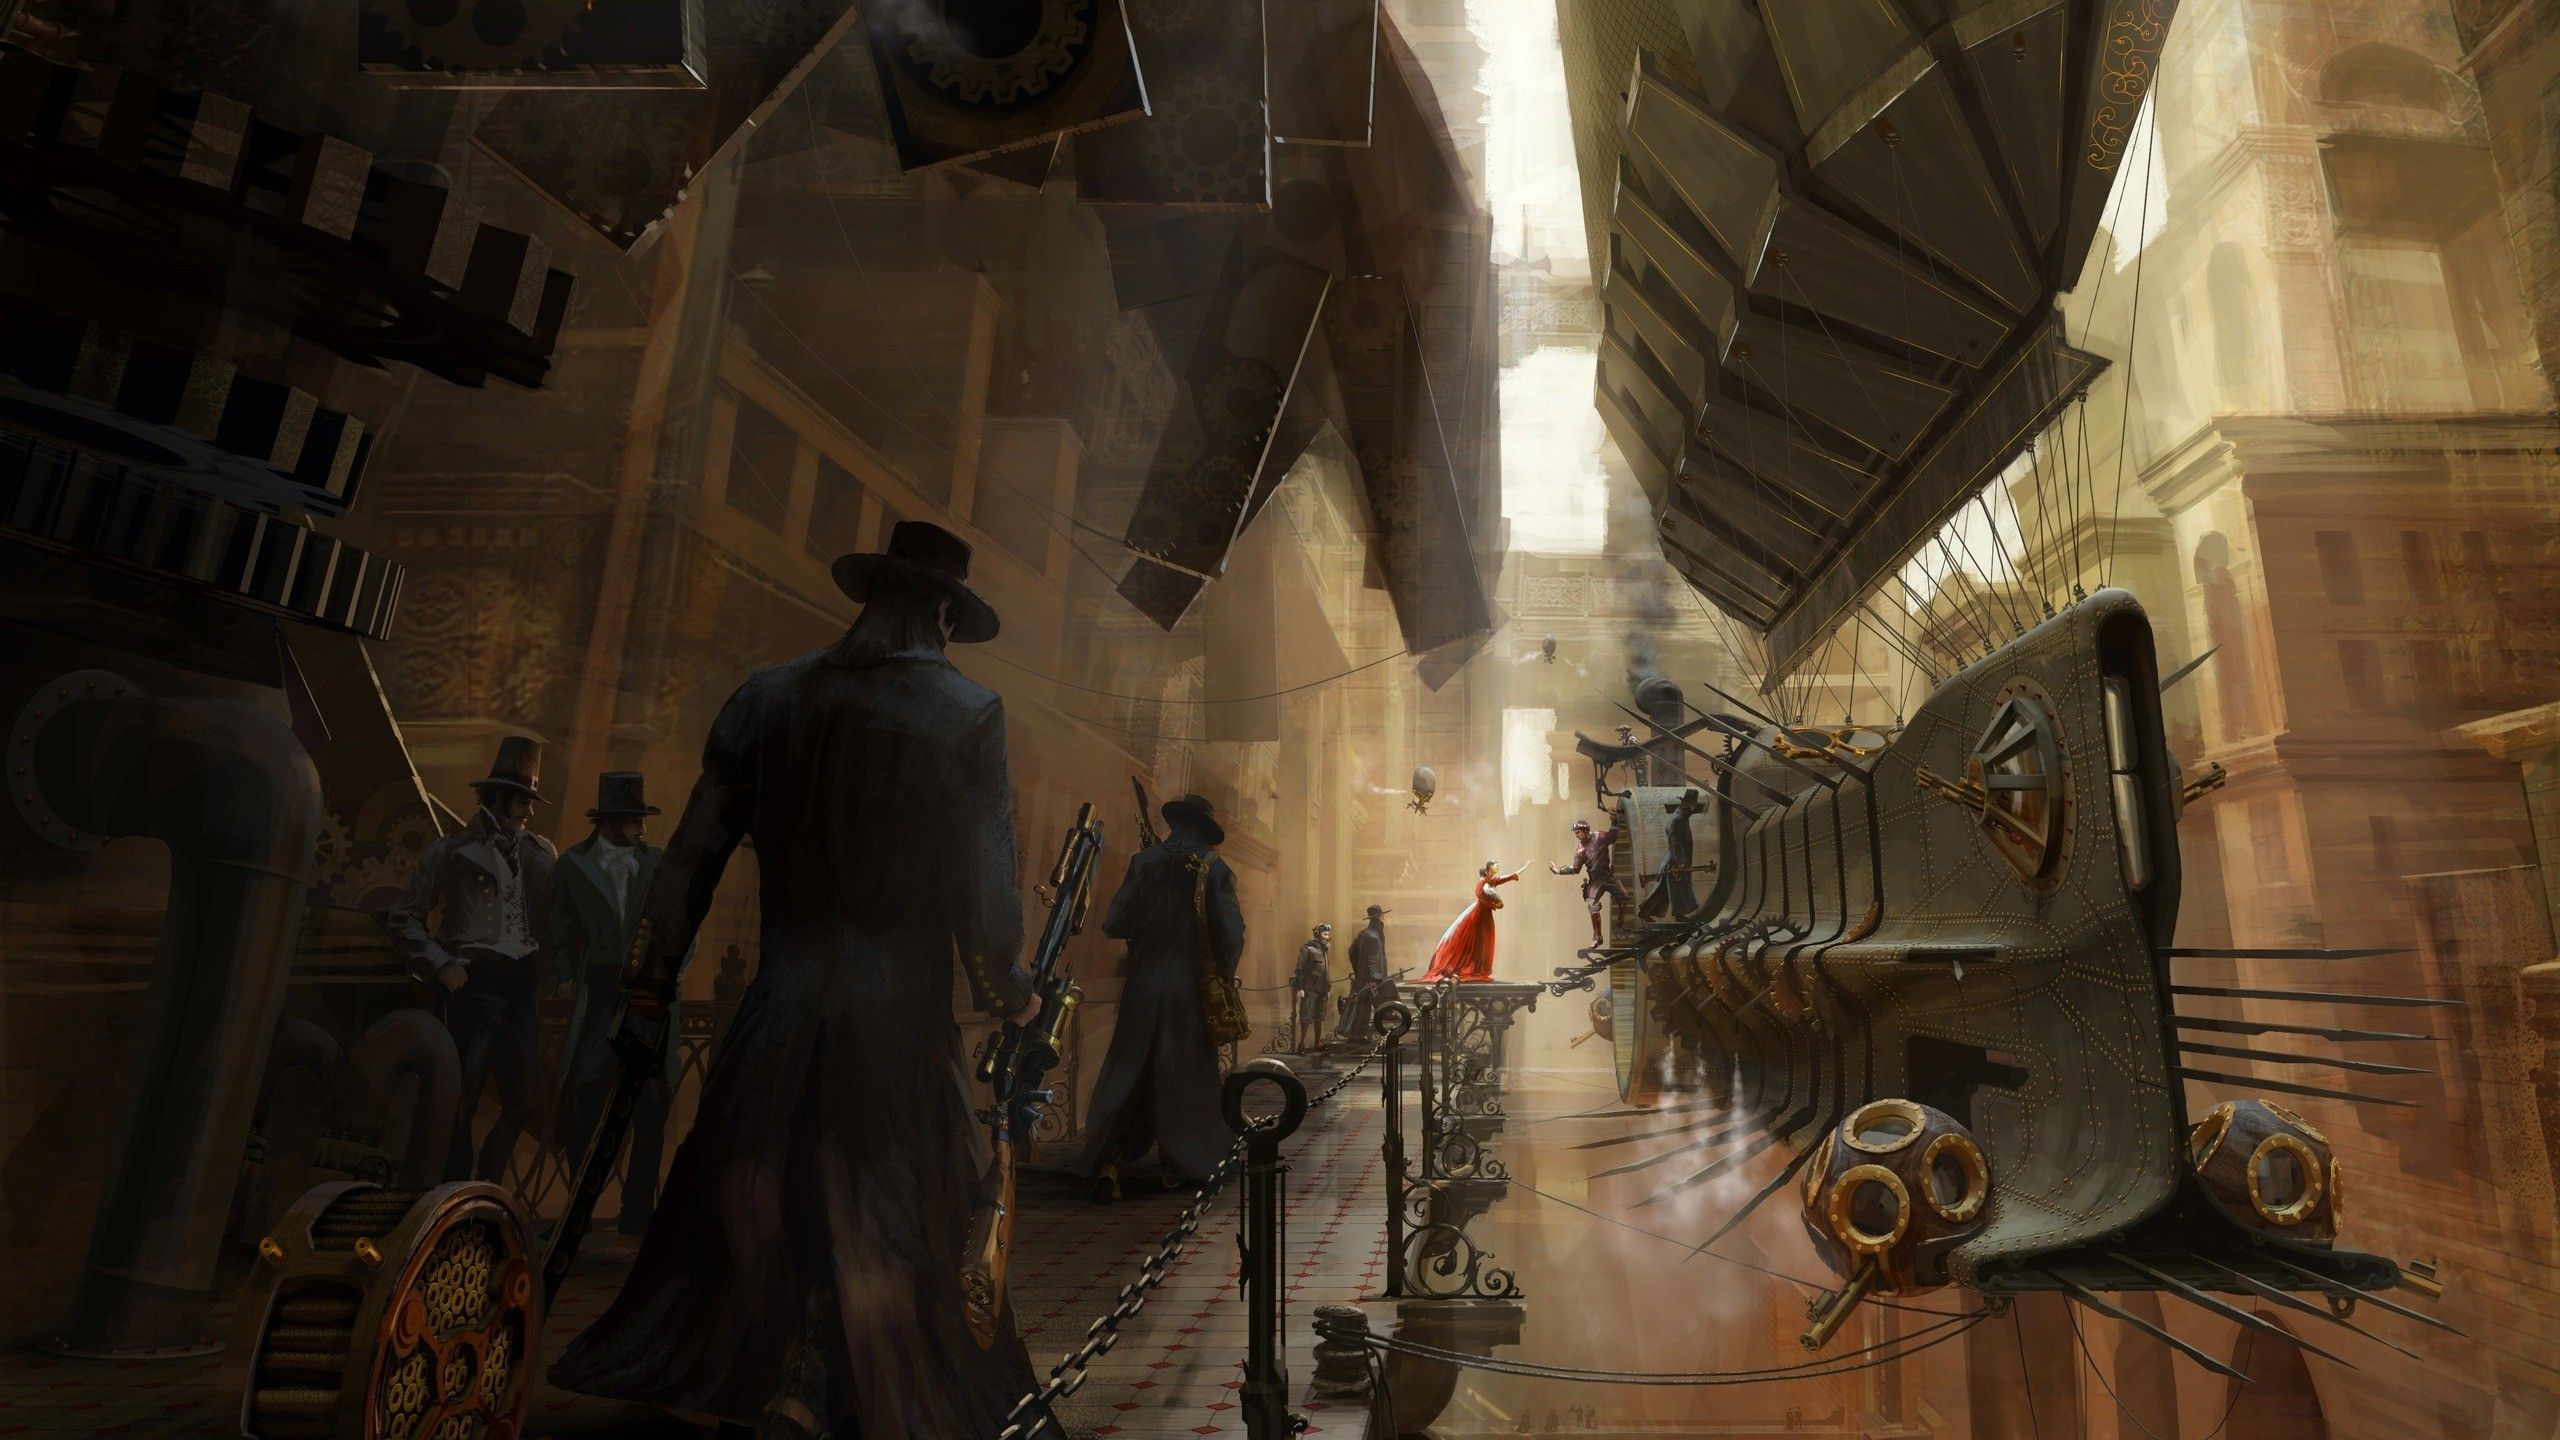 c57758505d202 Steampunk train station Wallpaper | Trains | Steampunk wallpaper ...